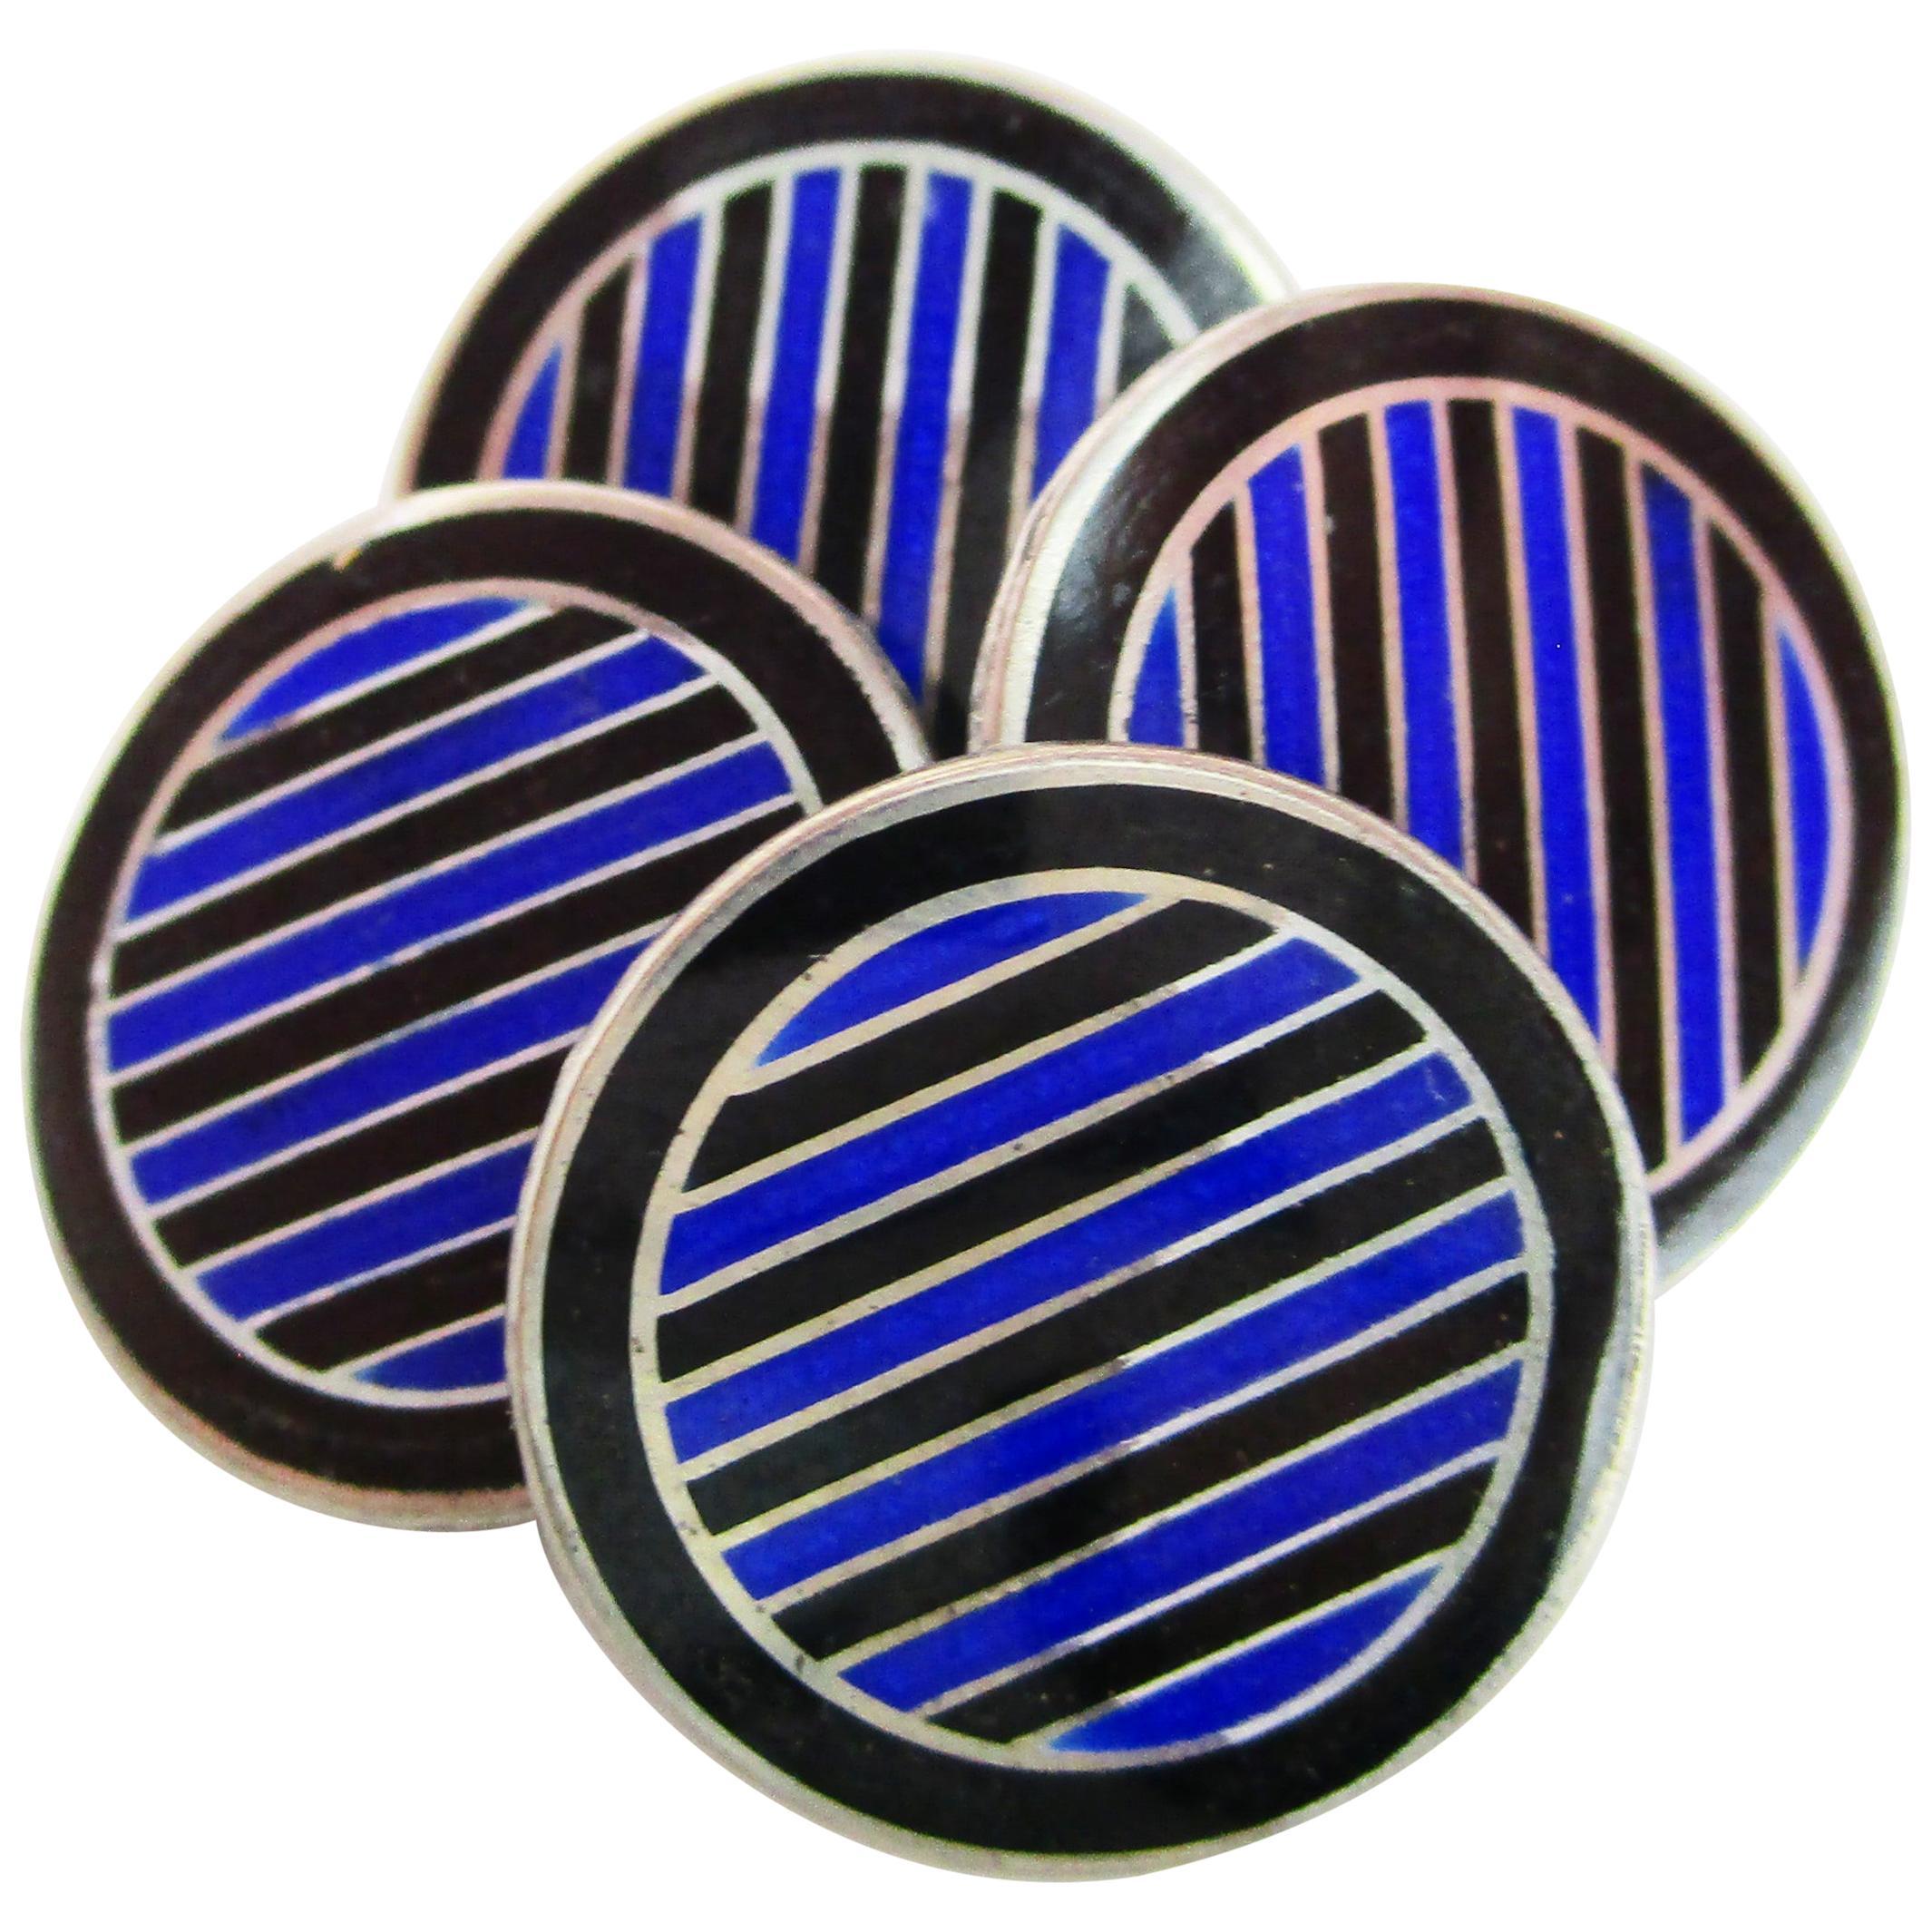 Art Deco Sterling Silver Black and Blue Enamel Cufflinks